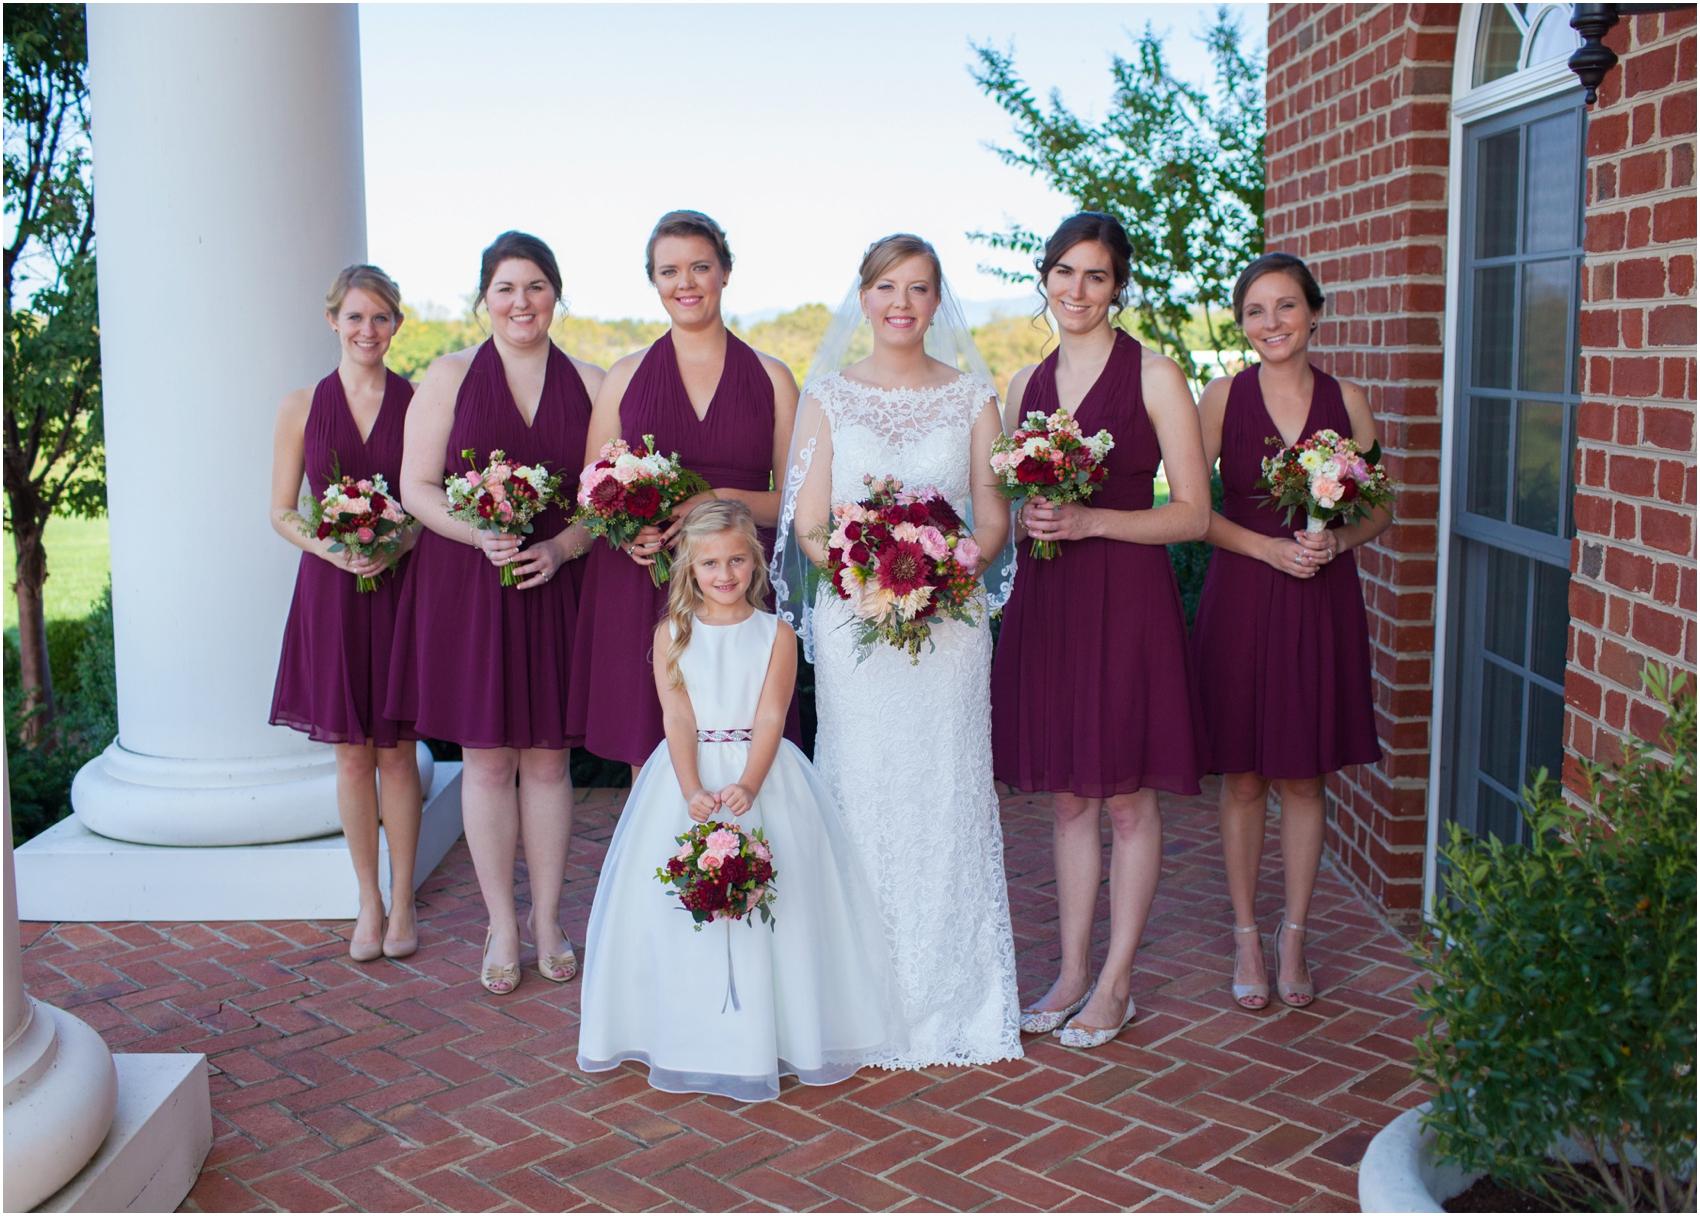 Columns-at-Six-Penny-Farm-Virginia-Fall-Wedding-7922.jpg